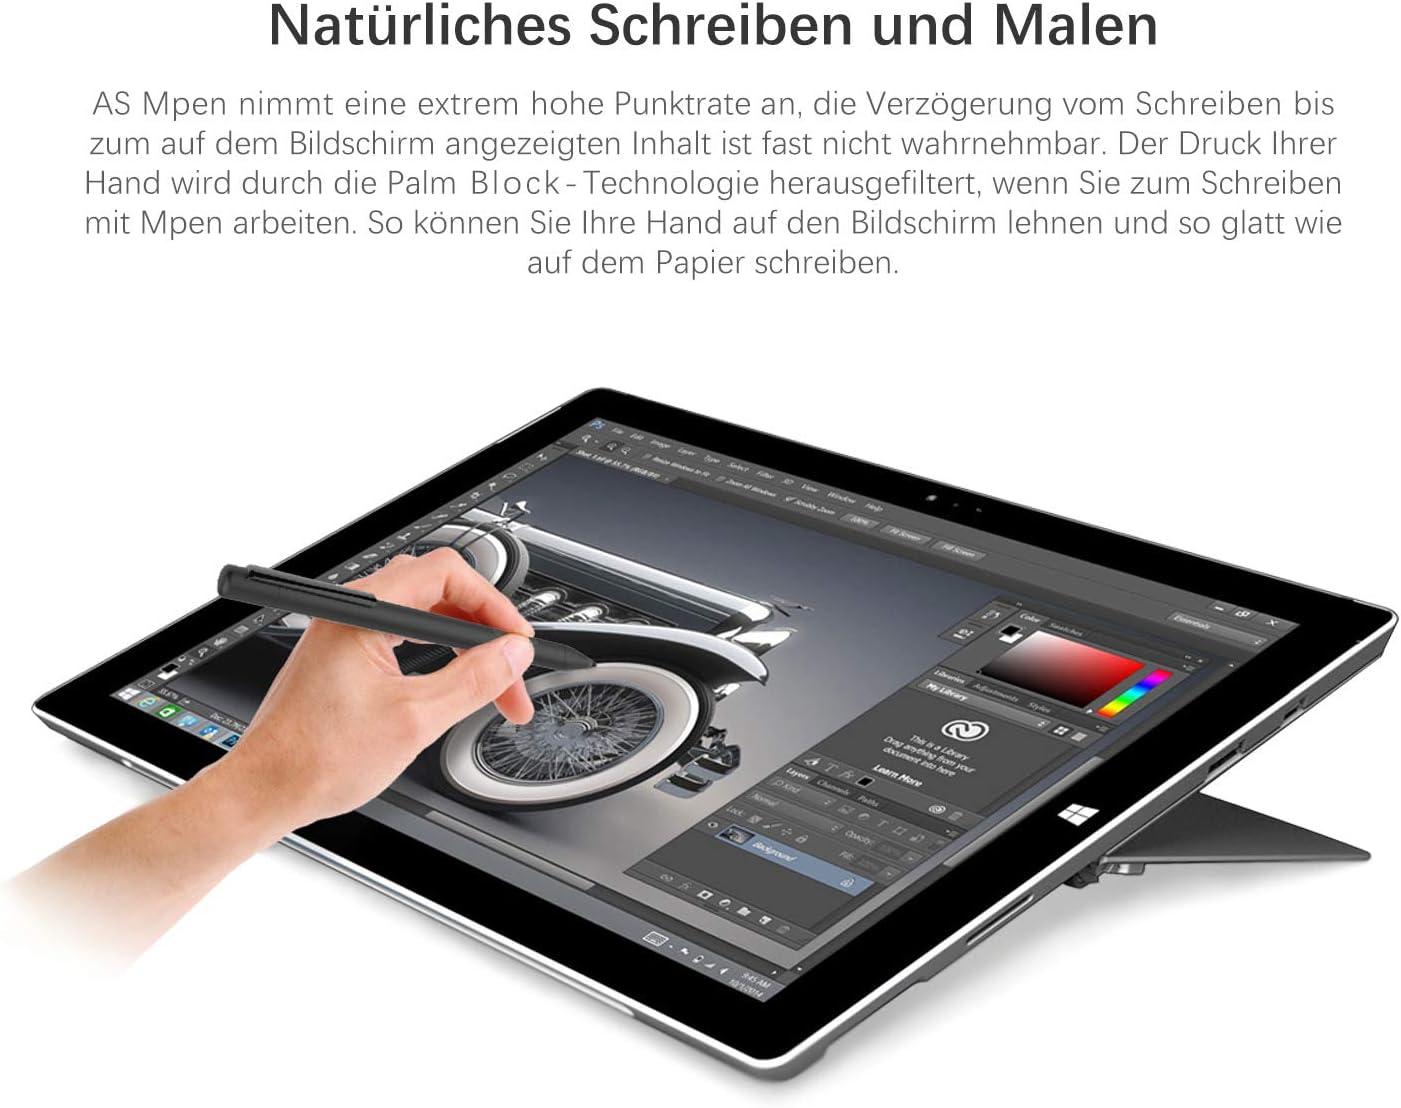 NEUE DAWN Stylus de repuesto para Surface Pen Microsoft Surface Pro,Surface 3,Surface Pro 3//4//6,Surface Laptop//Laptop2//Book//Book 2//Surface Studio//ASUS Vivobook Flip//T102HA//Spectre x360